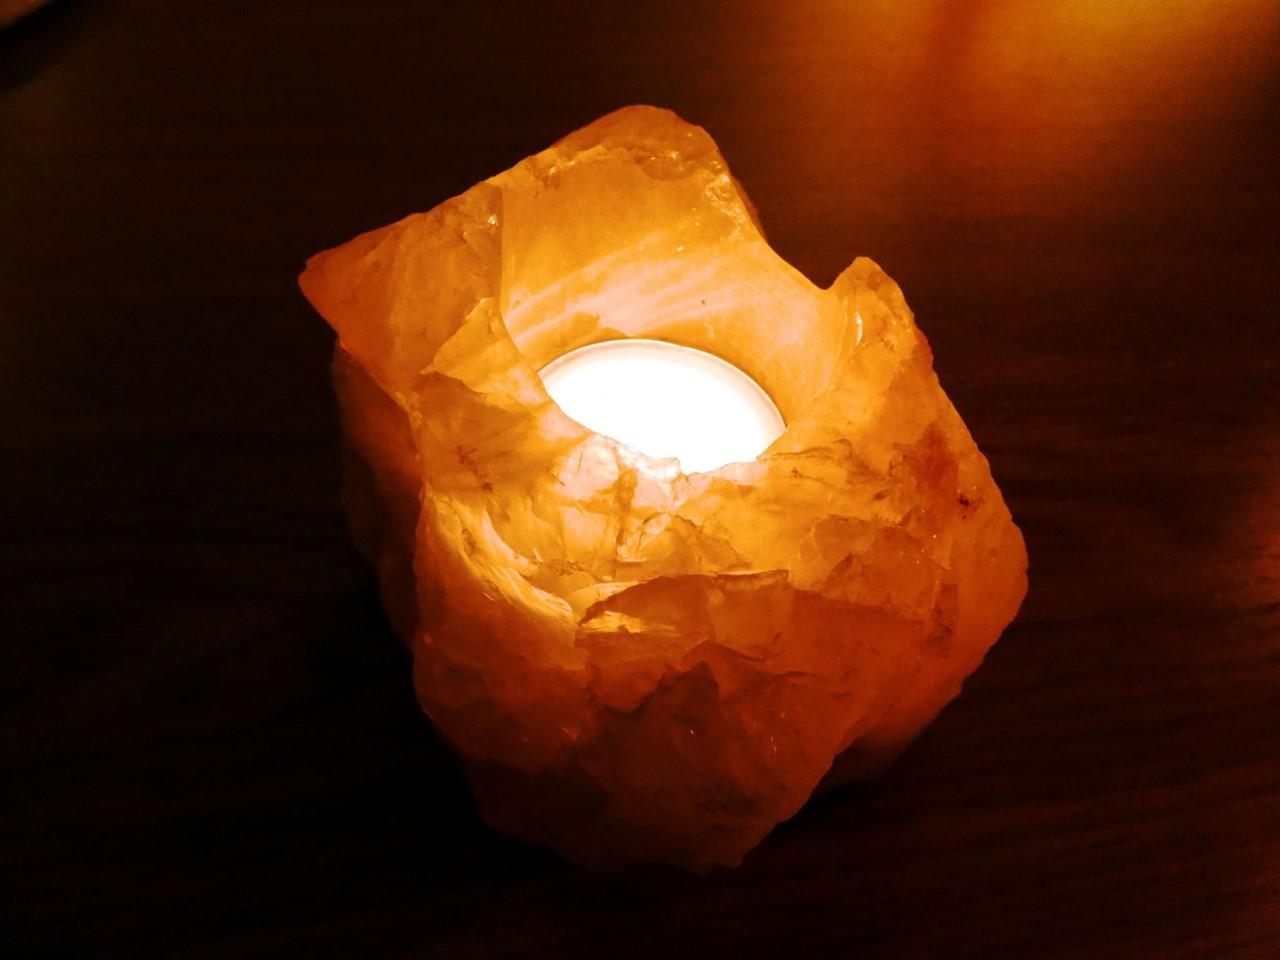 salt-lamp-573625